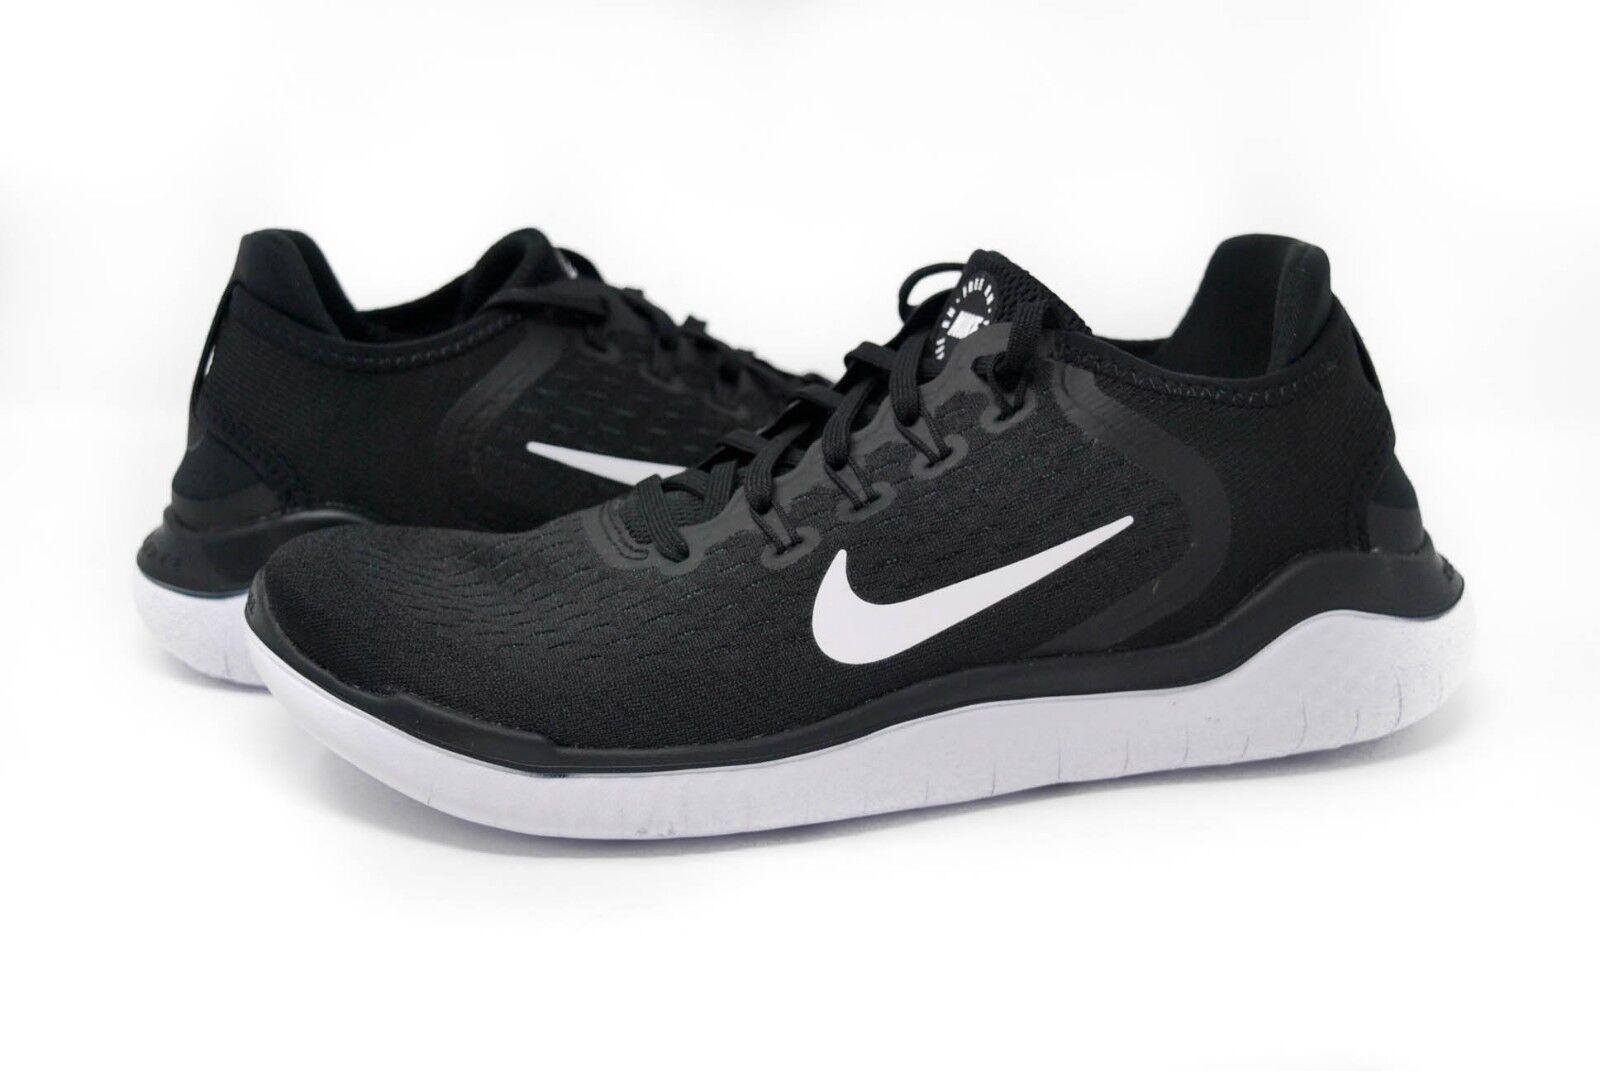 Nike uomini liberi nel 2018 942836-001 bianco nero sz gli 8 e i 13 nuovi